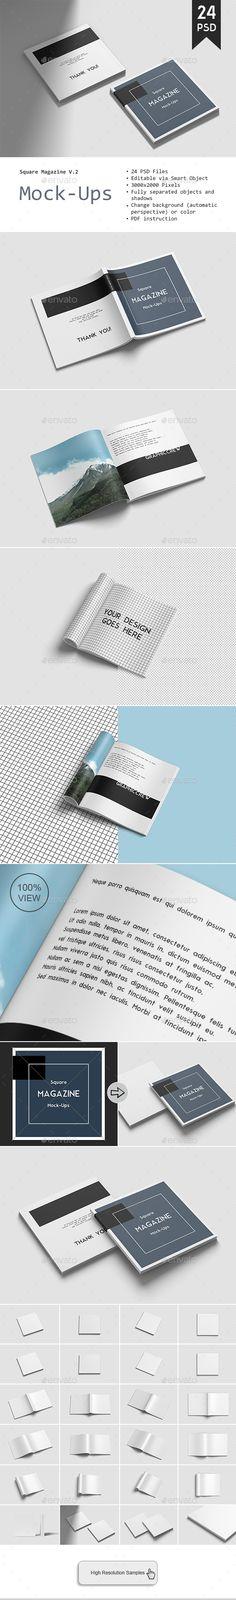 Square Magazine Mockup Vol. 2  #square #magazine #mockup #Mockups #mocku-ups #envato #graphicriver #brochure #template